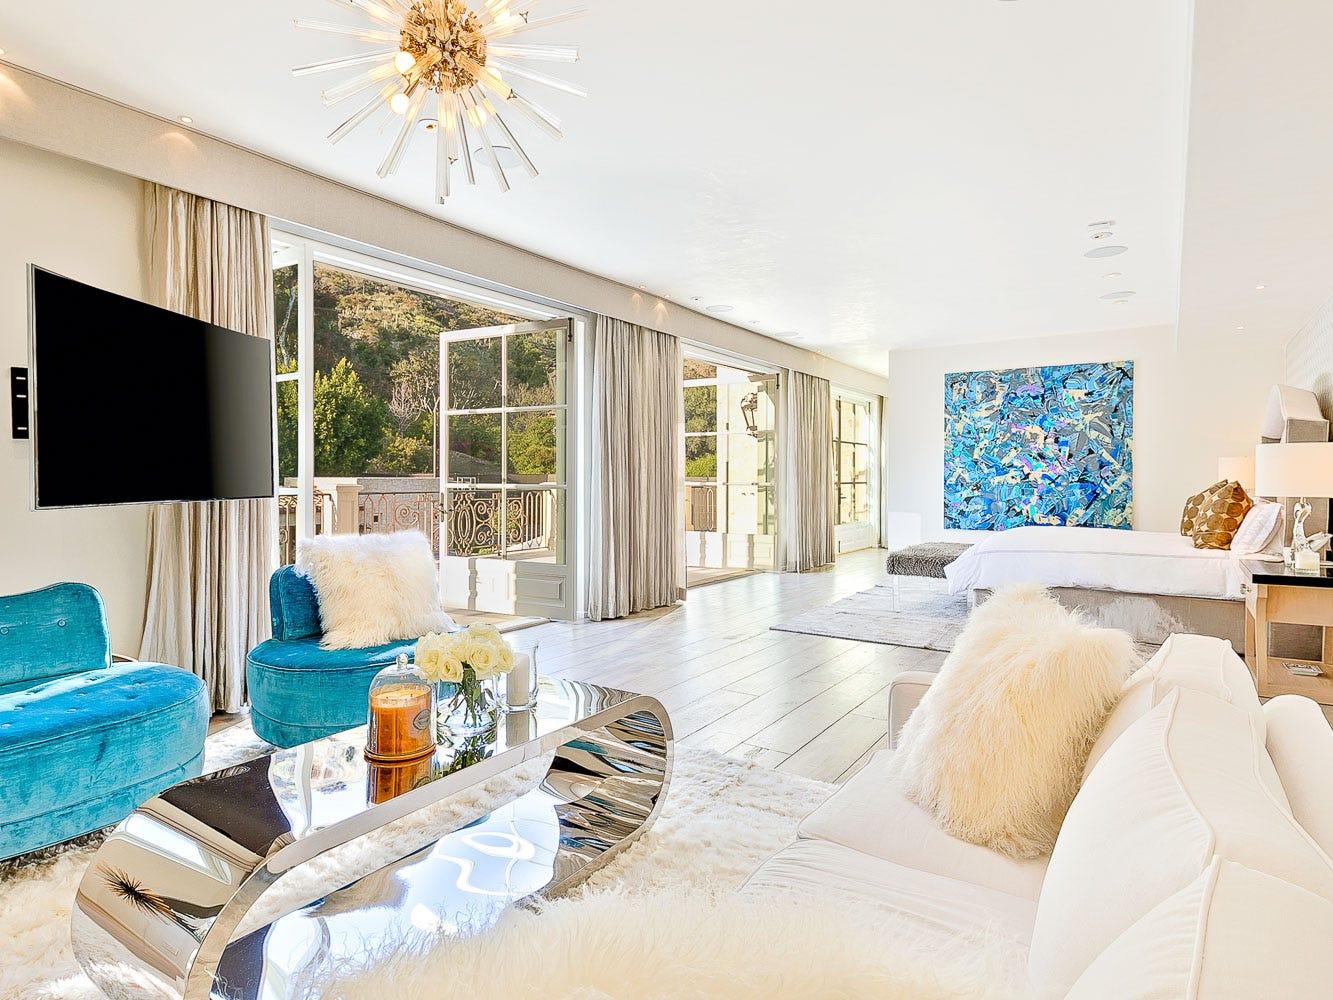 For more information: https://www.luxuryretreats.com/vacation-rentals/united-states/california-los-angeles/malibu/petra-manor-122360